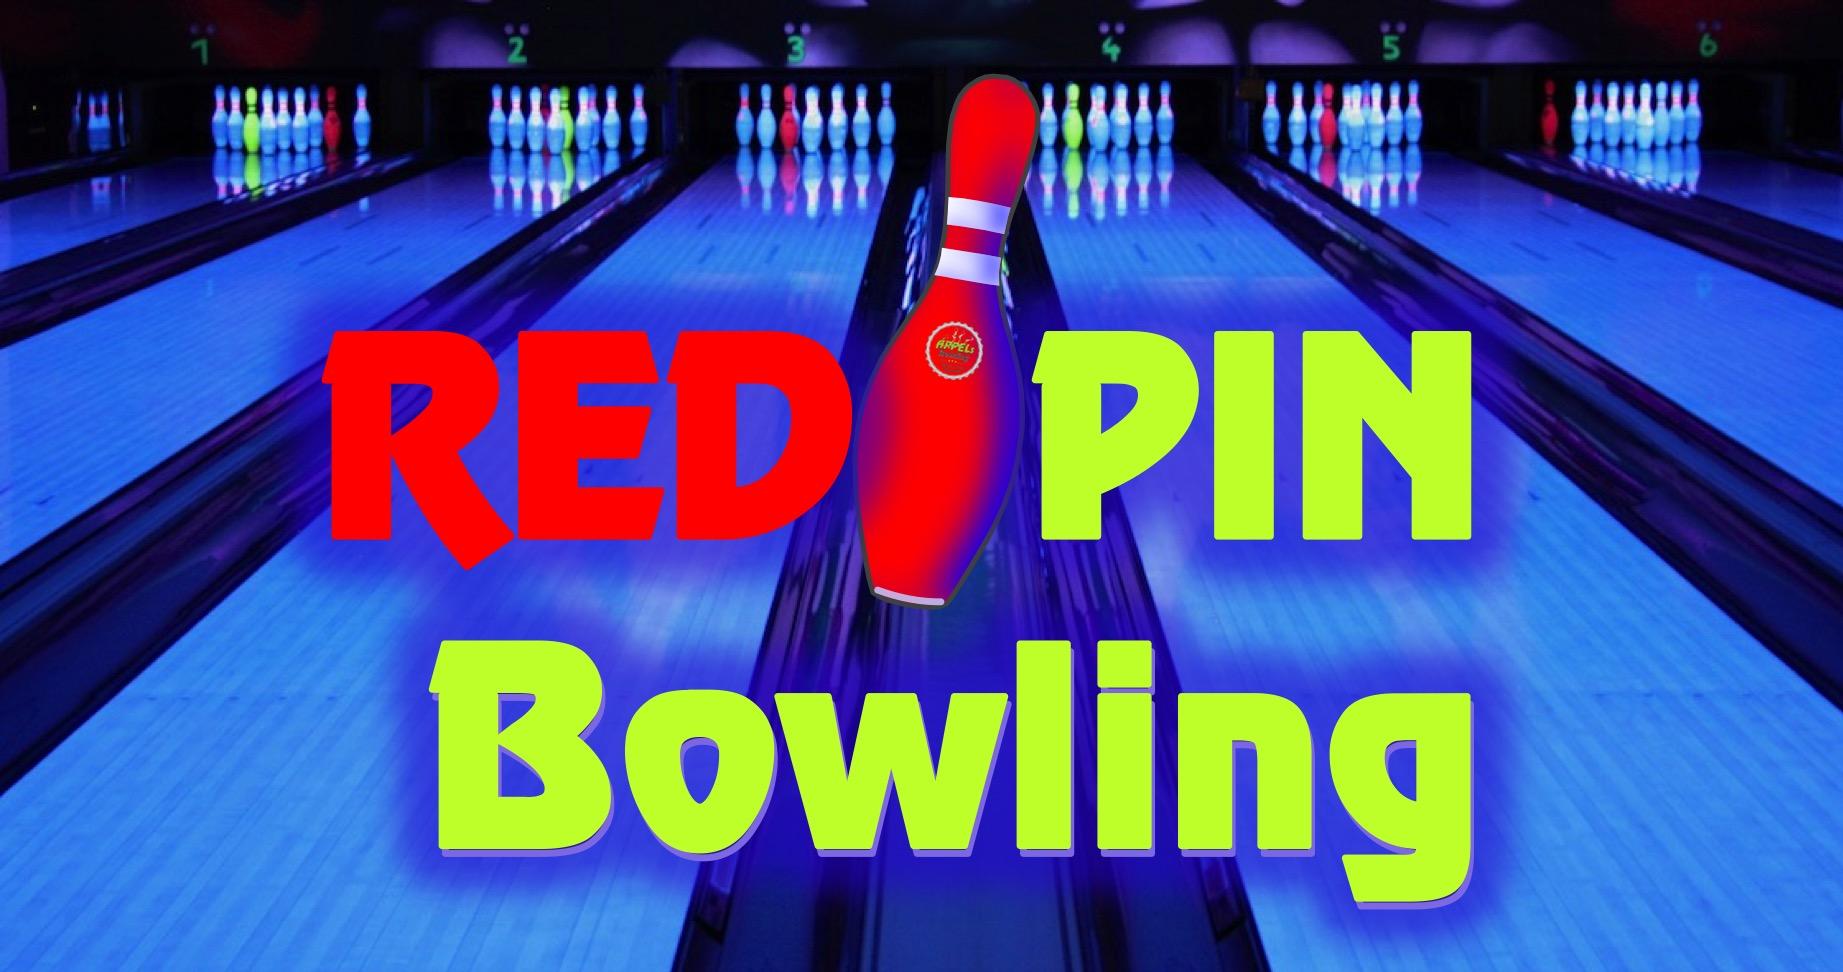 Bowling wedemark